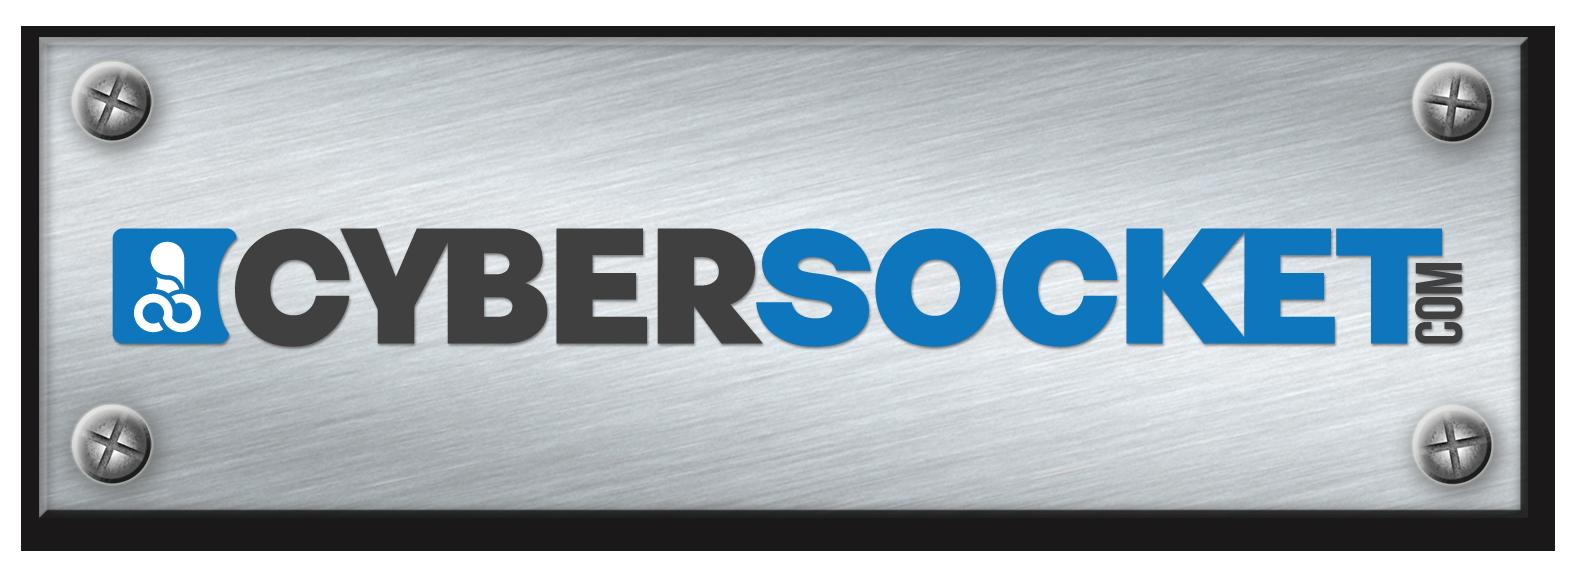 Cybersocket.com